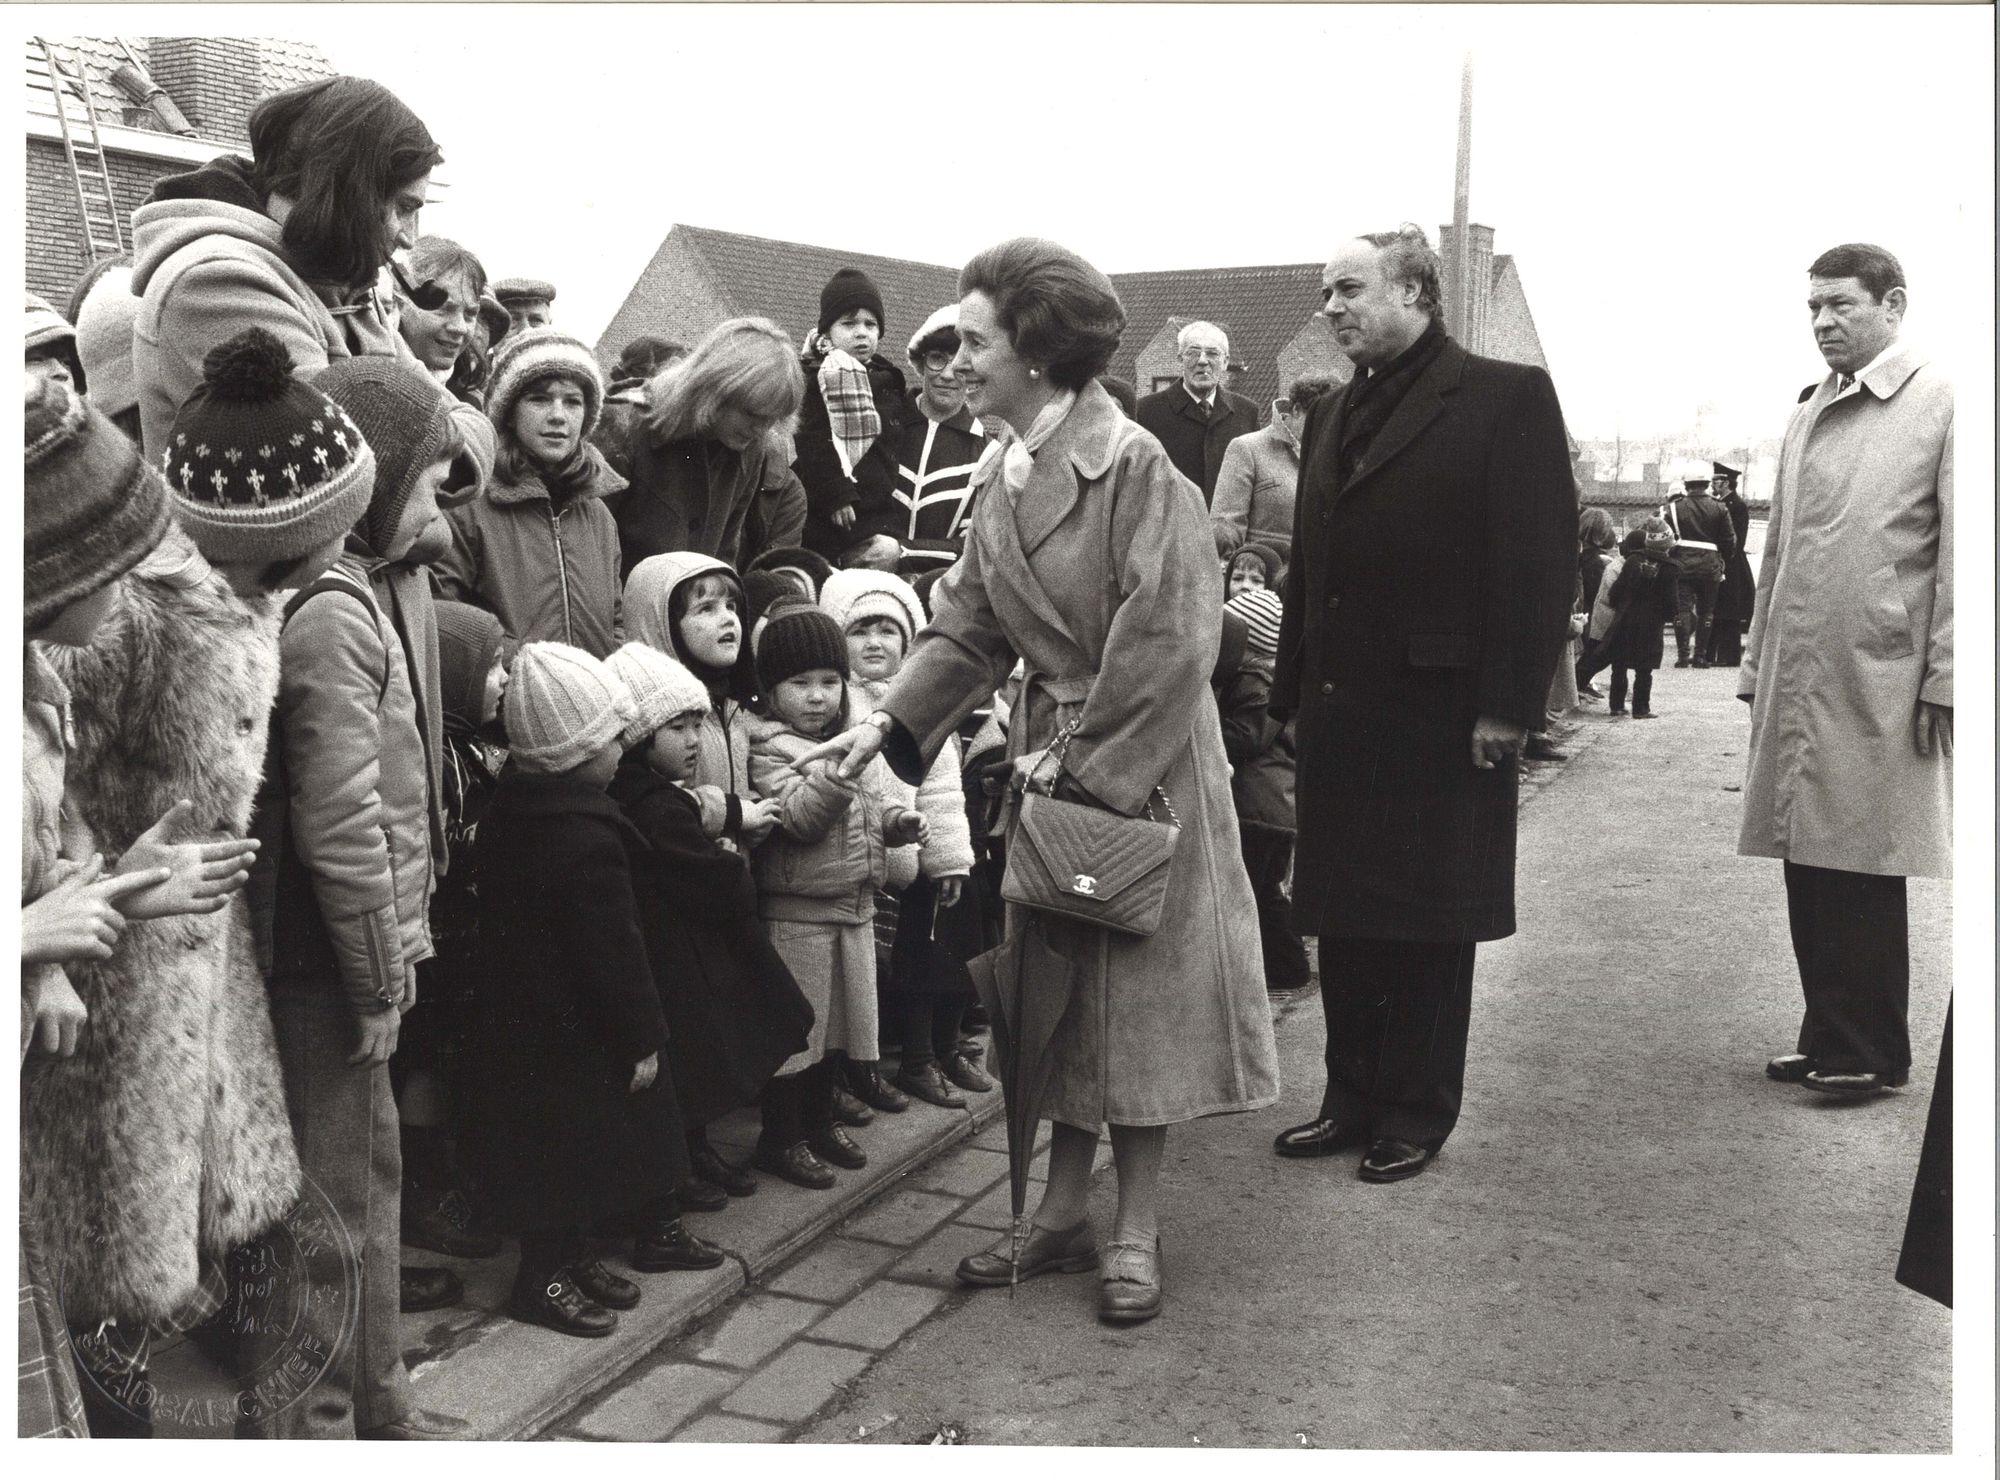 Koningin Fabiola bezoekt kinderboerderij in Marke